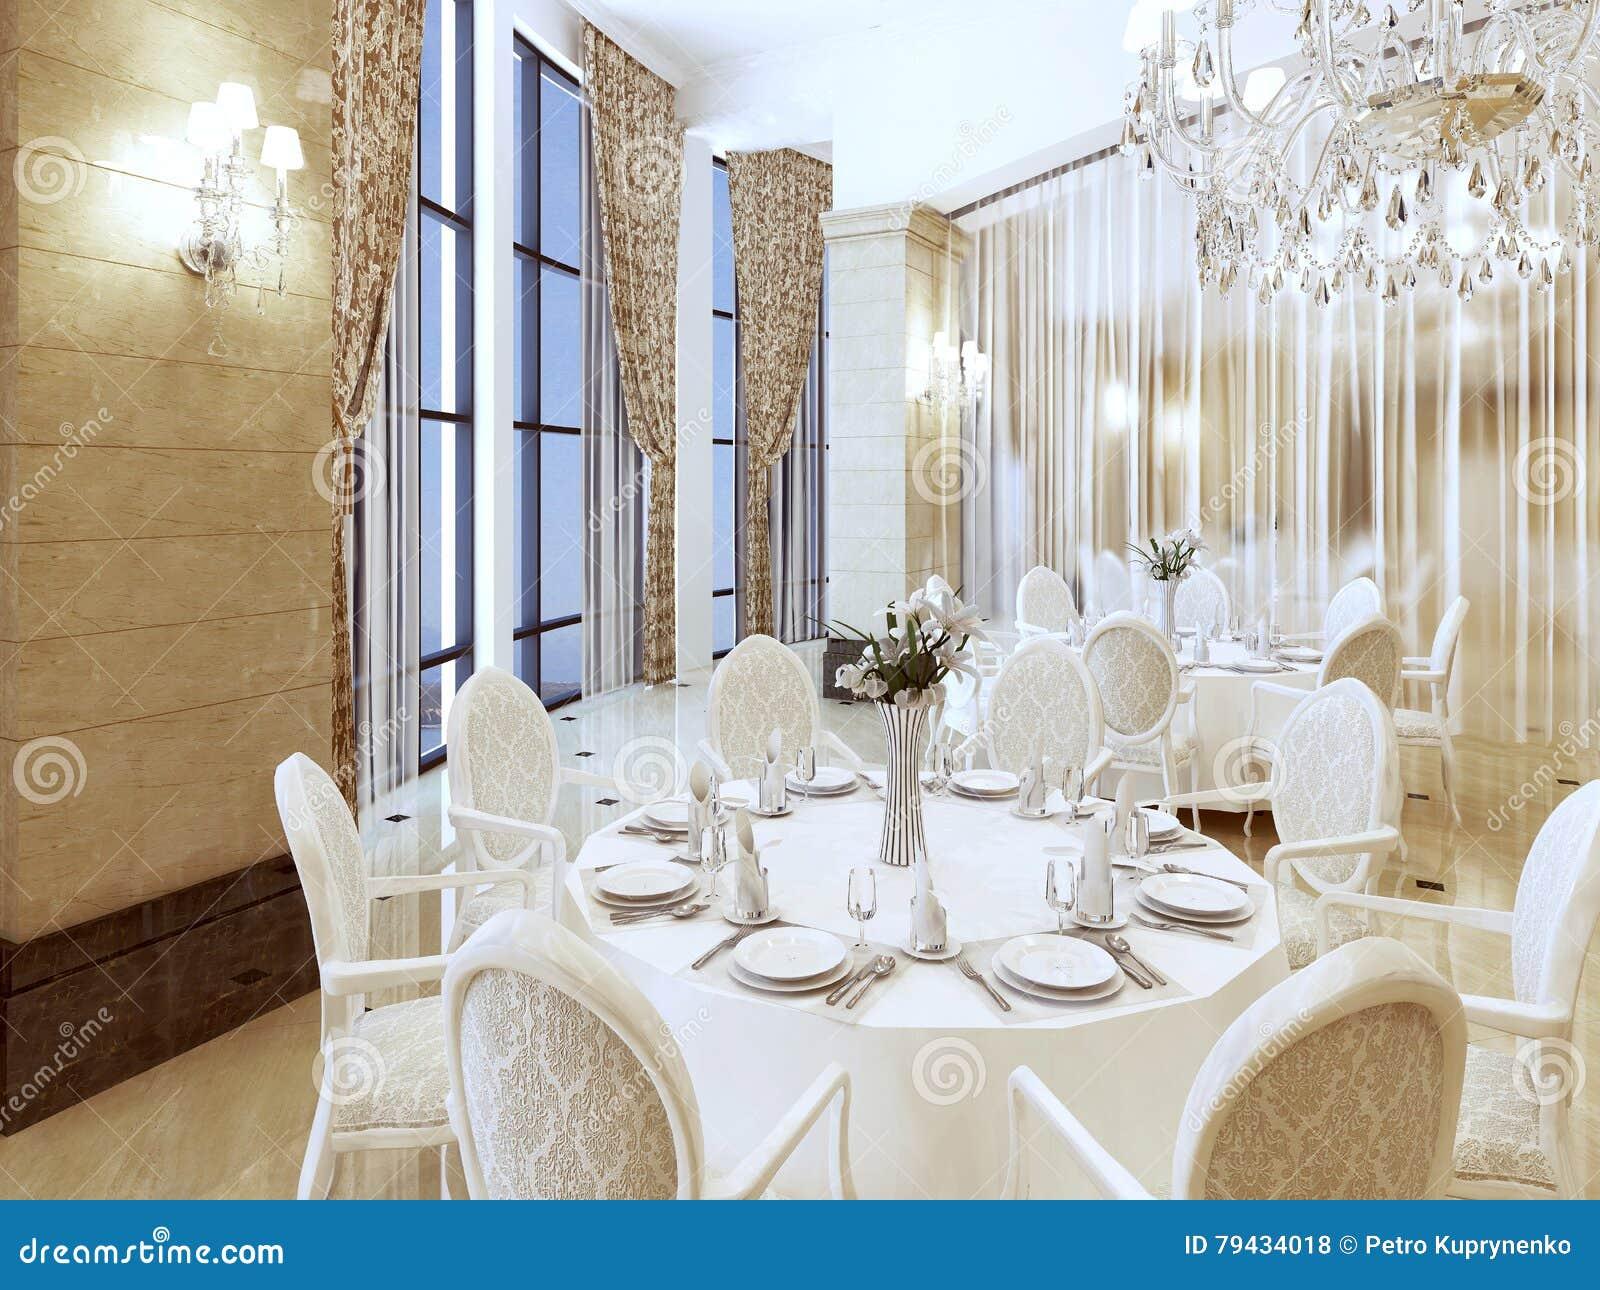 385179d2e8e Enjoy A Luxurious White Restaurant Table. Stock Illustration ...